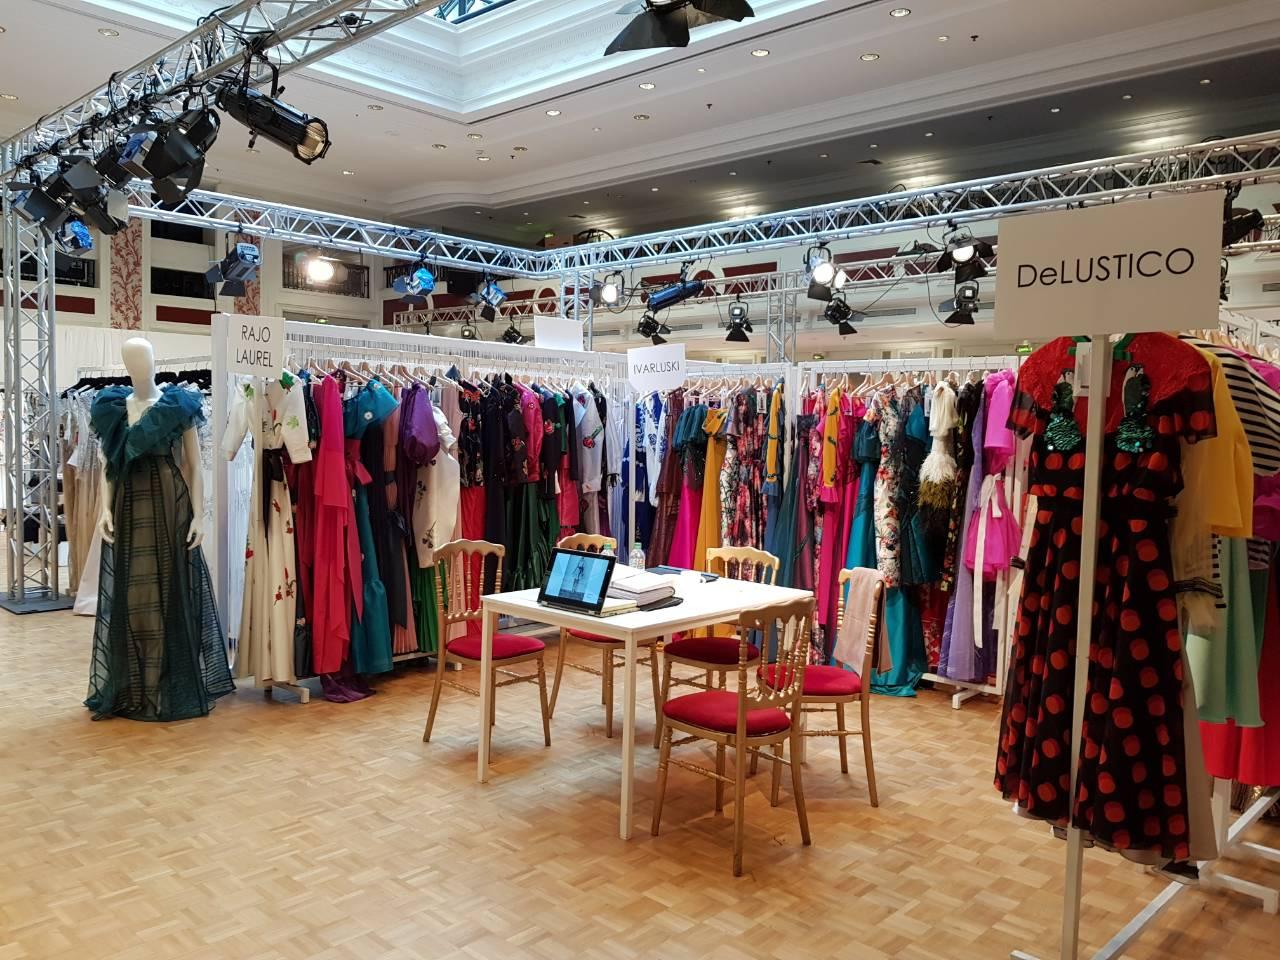 Dennis Lustico's DeLUSTICO collection at the Fashion Design Trade and Exhibit S/S 2018